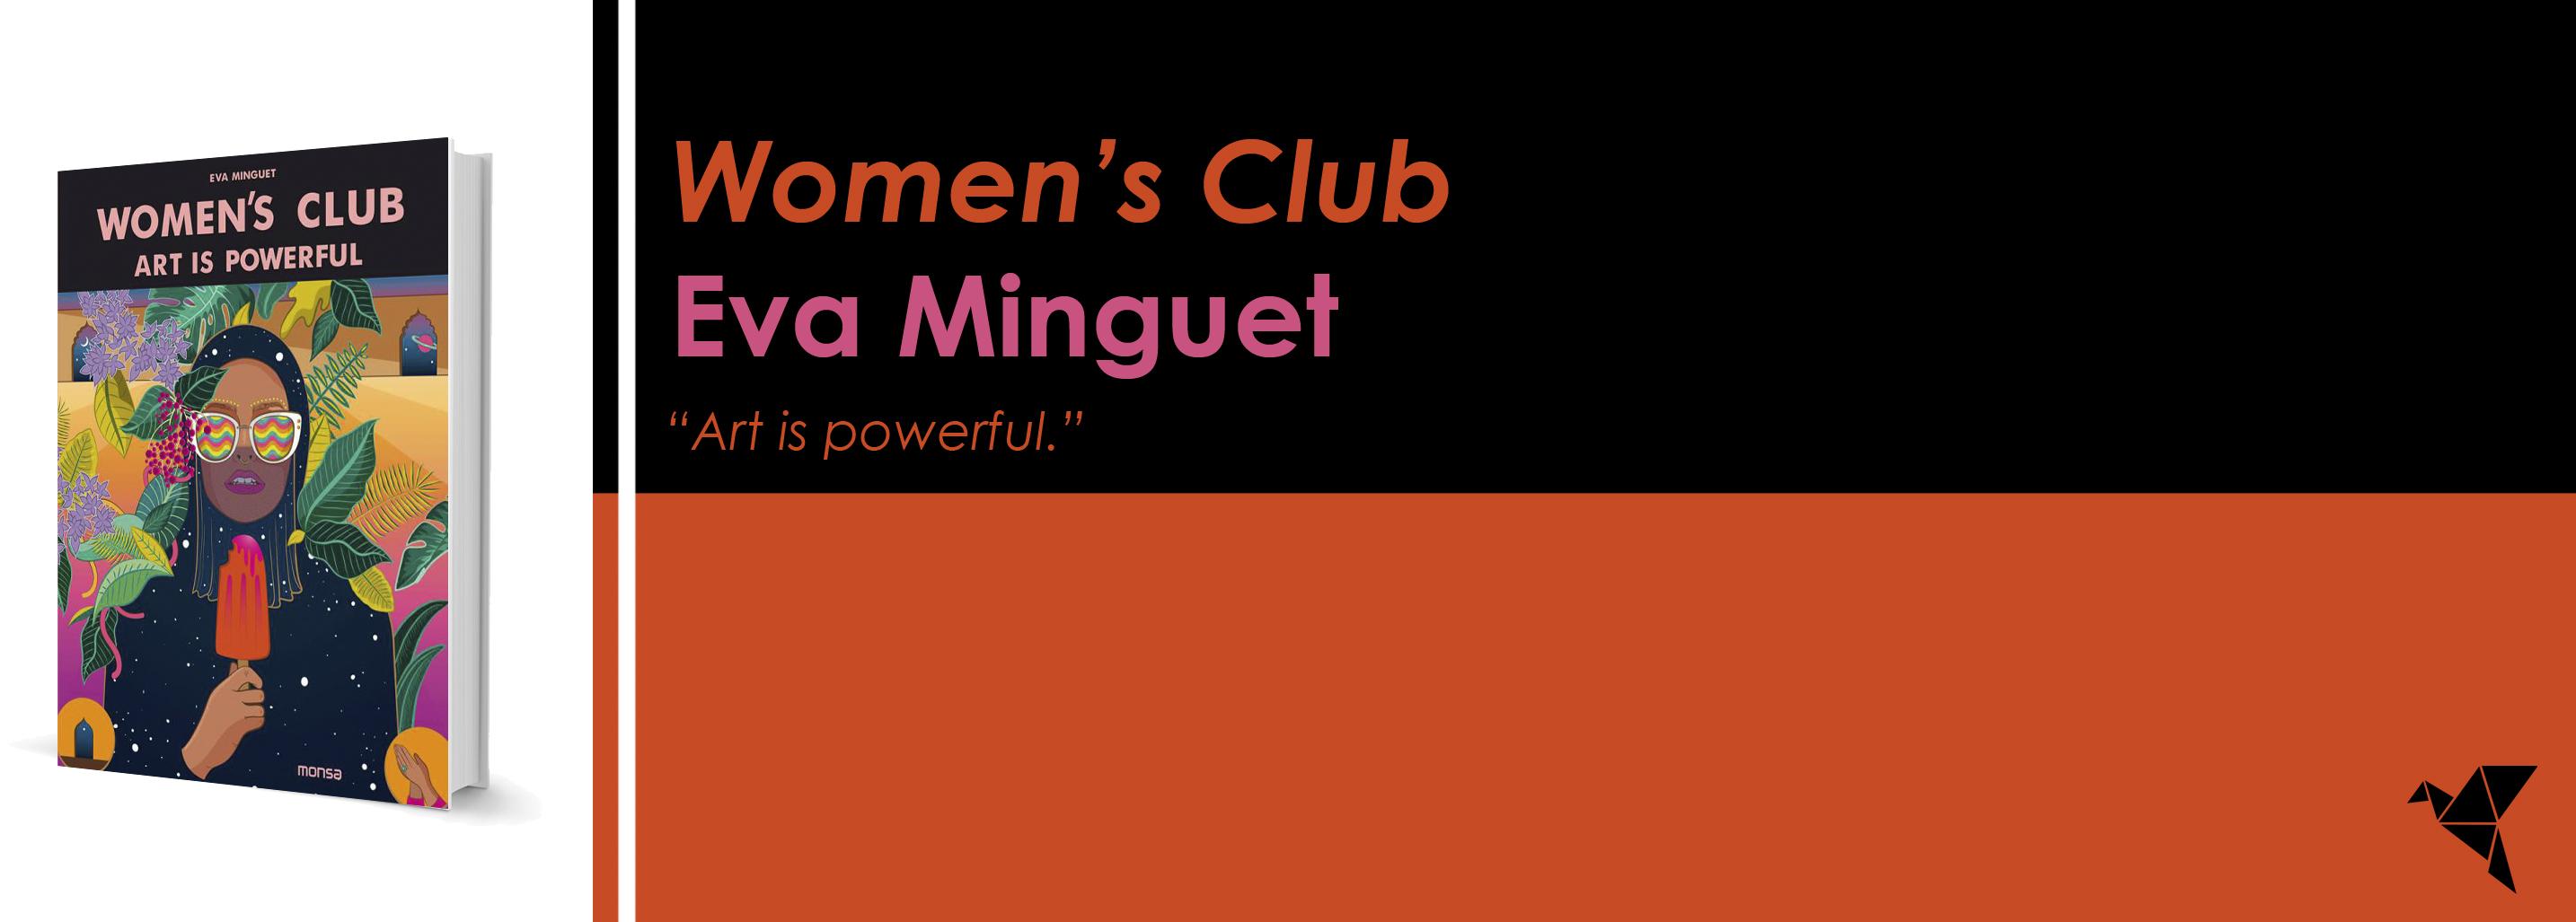 Women's Clubs, de Eva Minguet